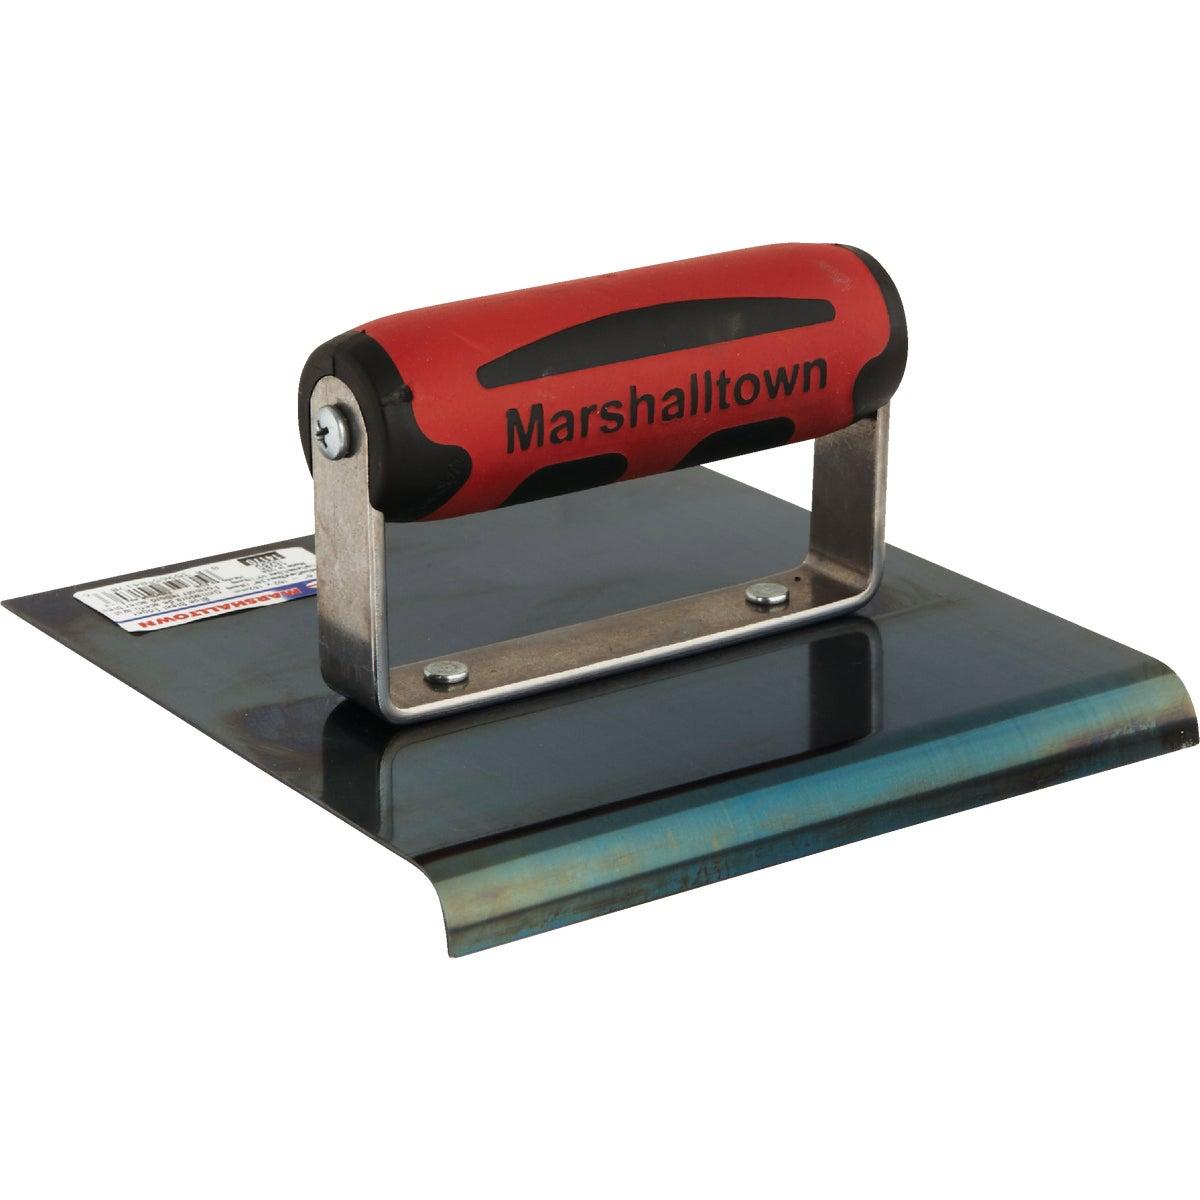 162BD 6X6 BS EDGER - 14170 by Marshalltown Trowel